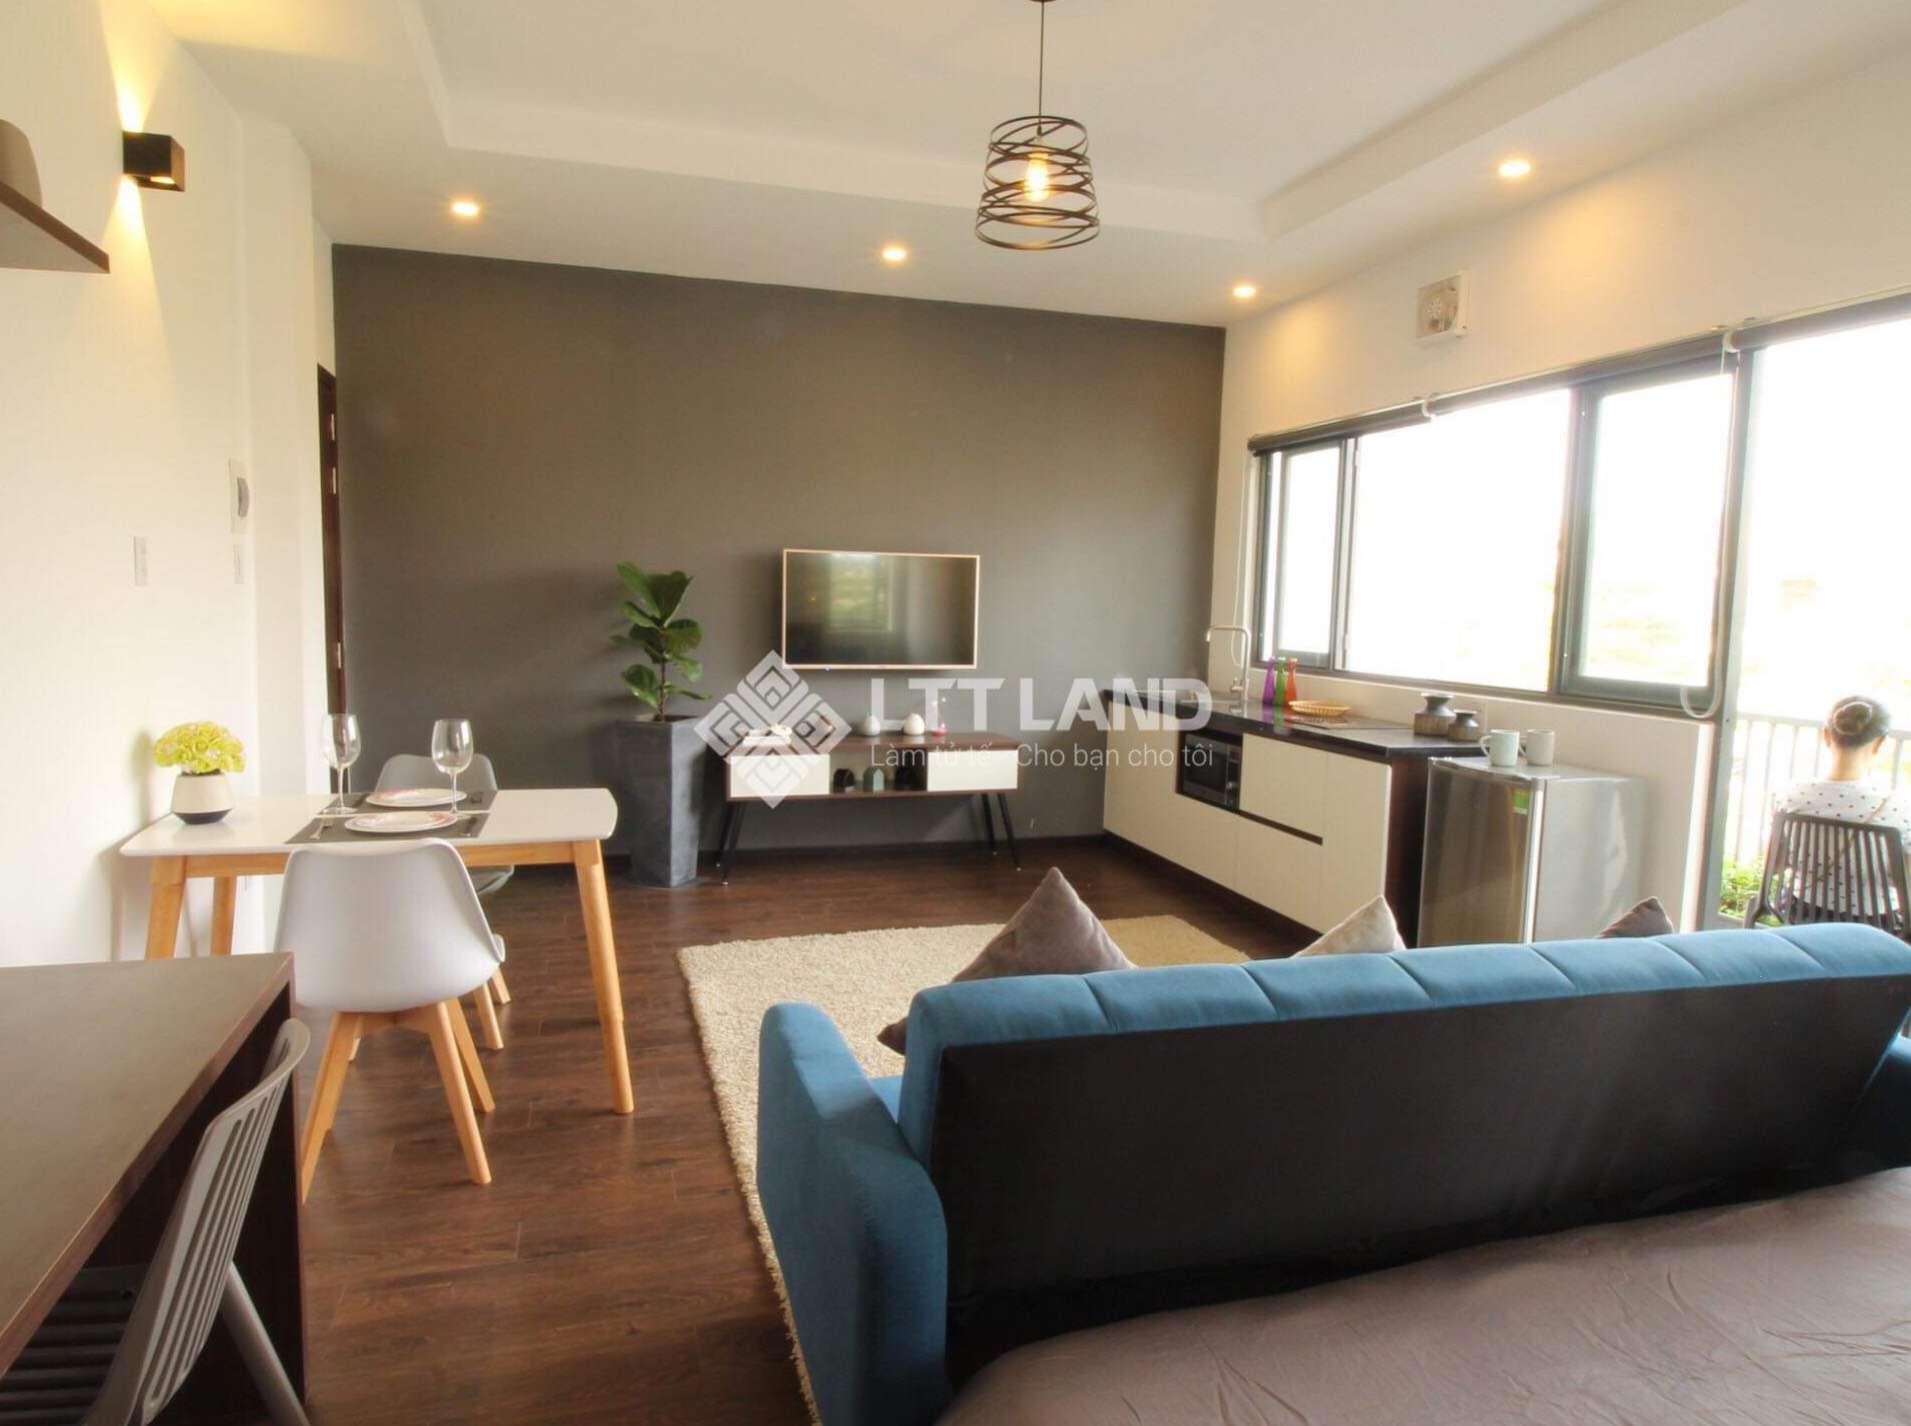 Apartment for rent in Da Nang